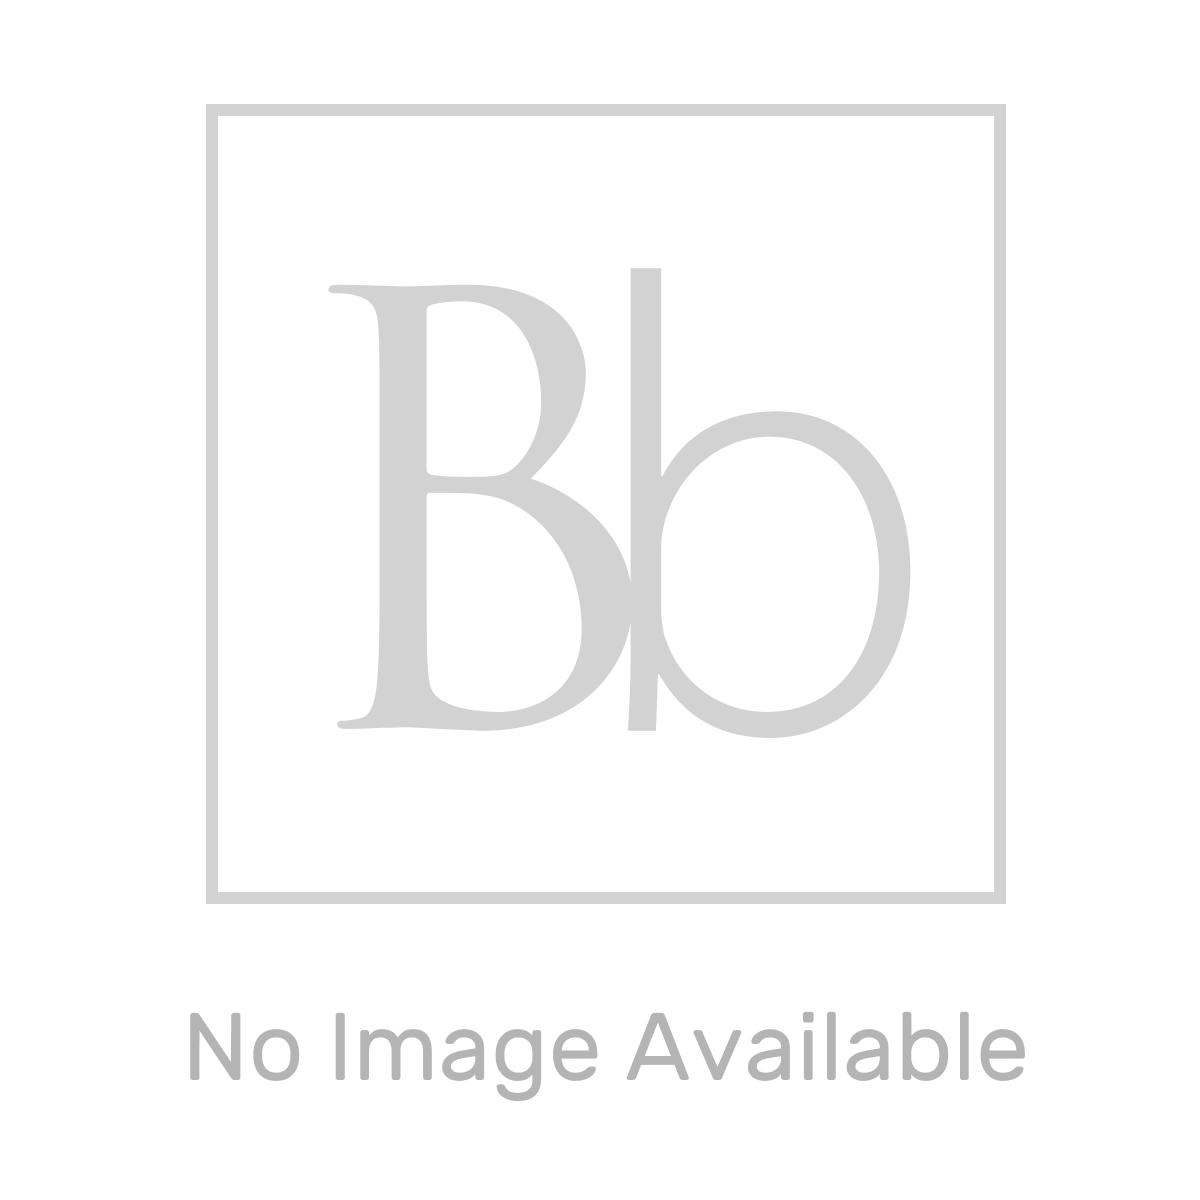 Nymas Dark Blue Padded Doc M Shower Seat with Legs